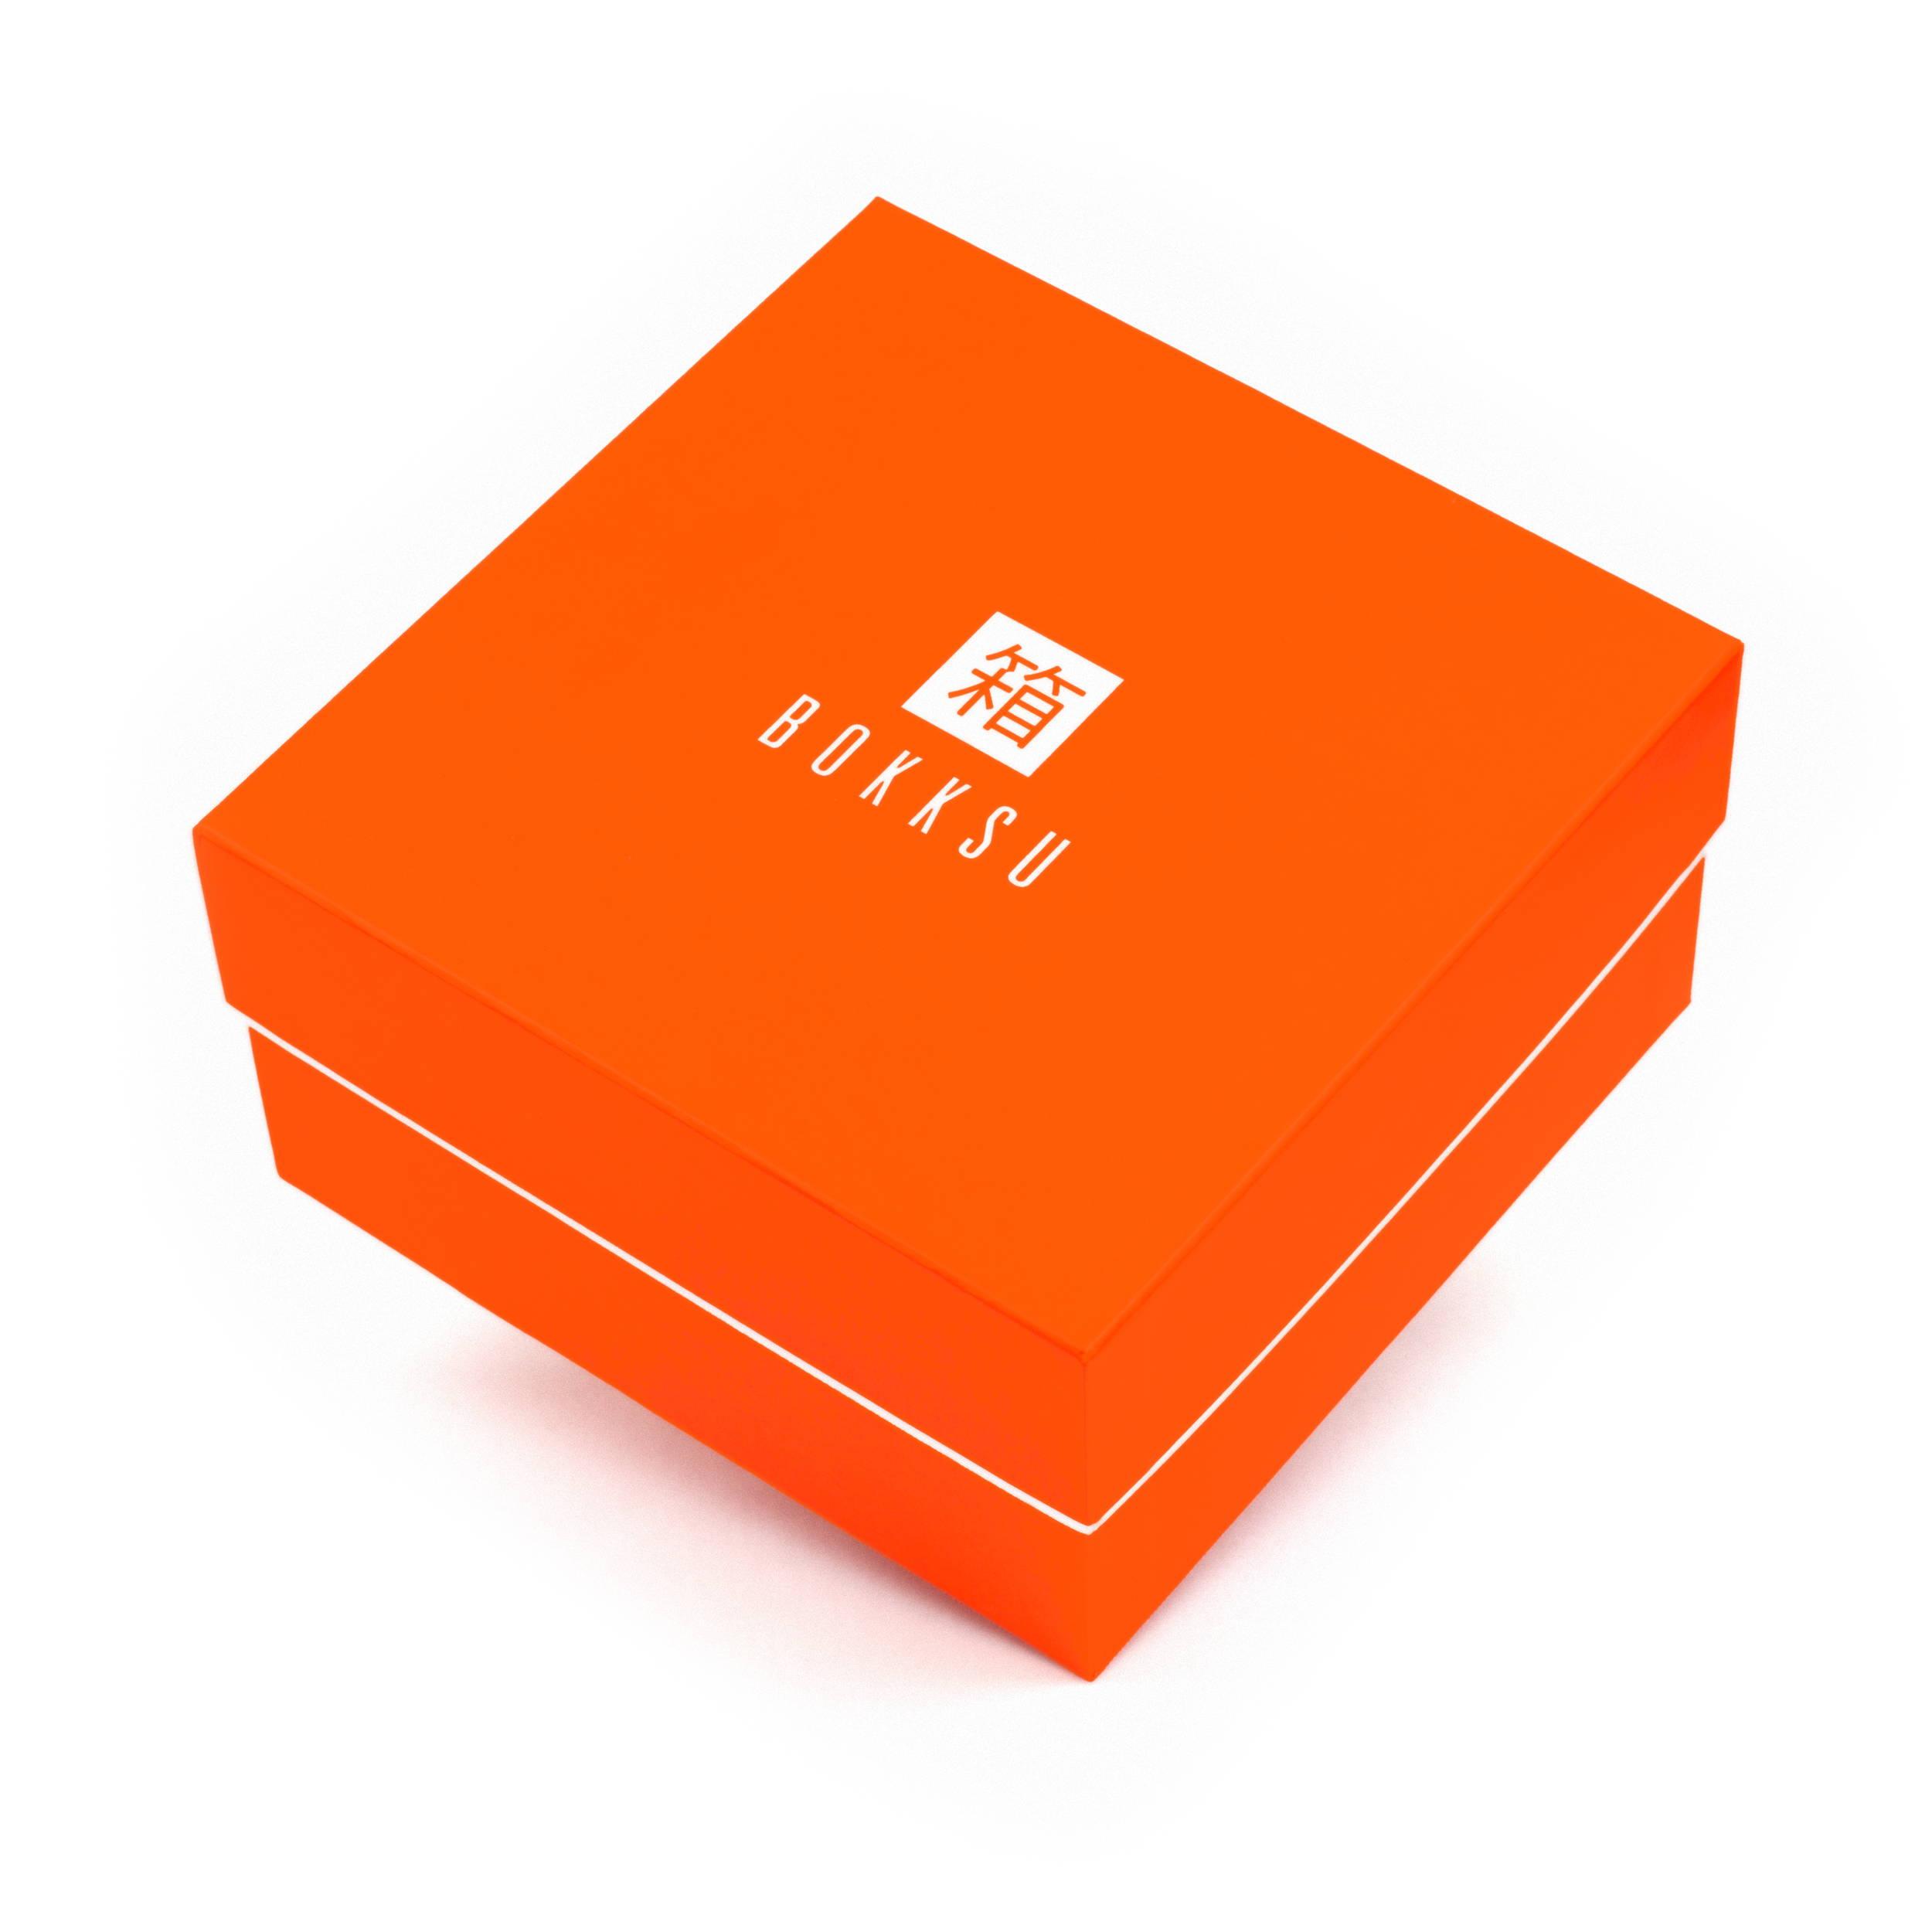 Classic Bokksu Box